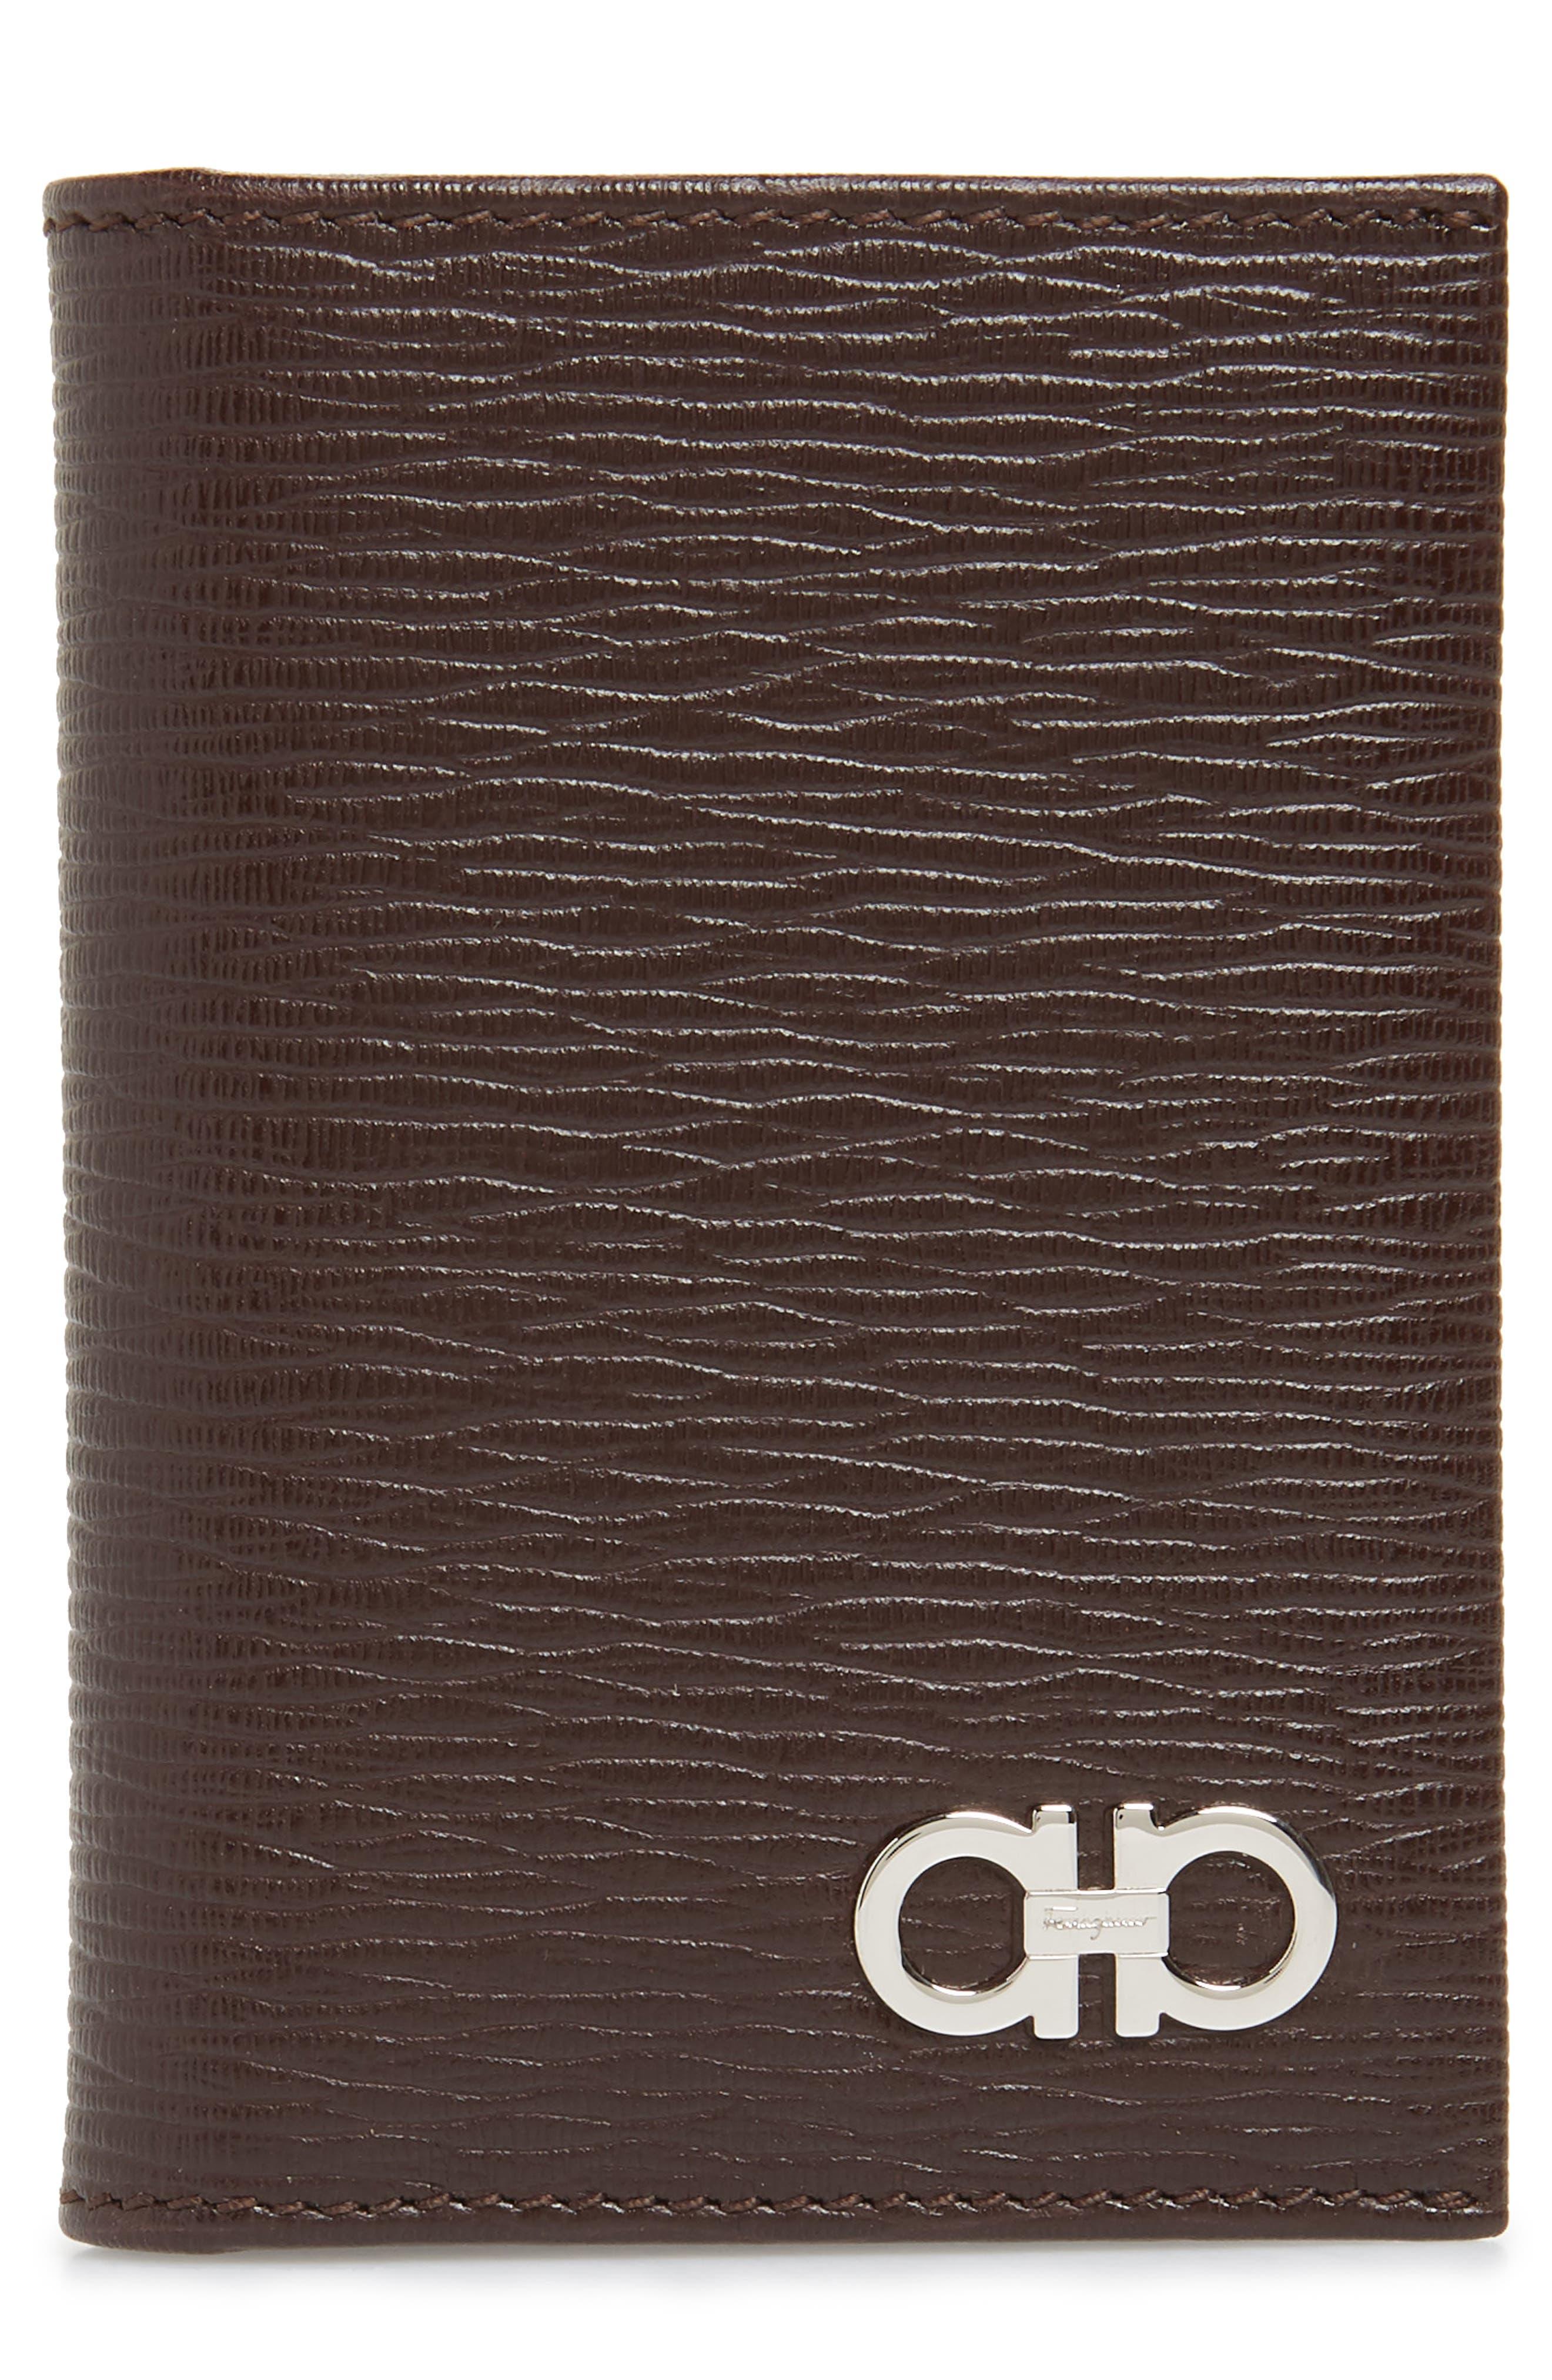 SALVATORE FERRAGAMO, Revival Leather Card Case, Main thumbnail 1, color, TOBACCO